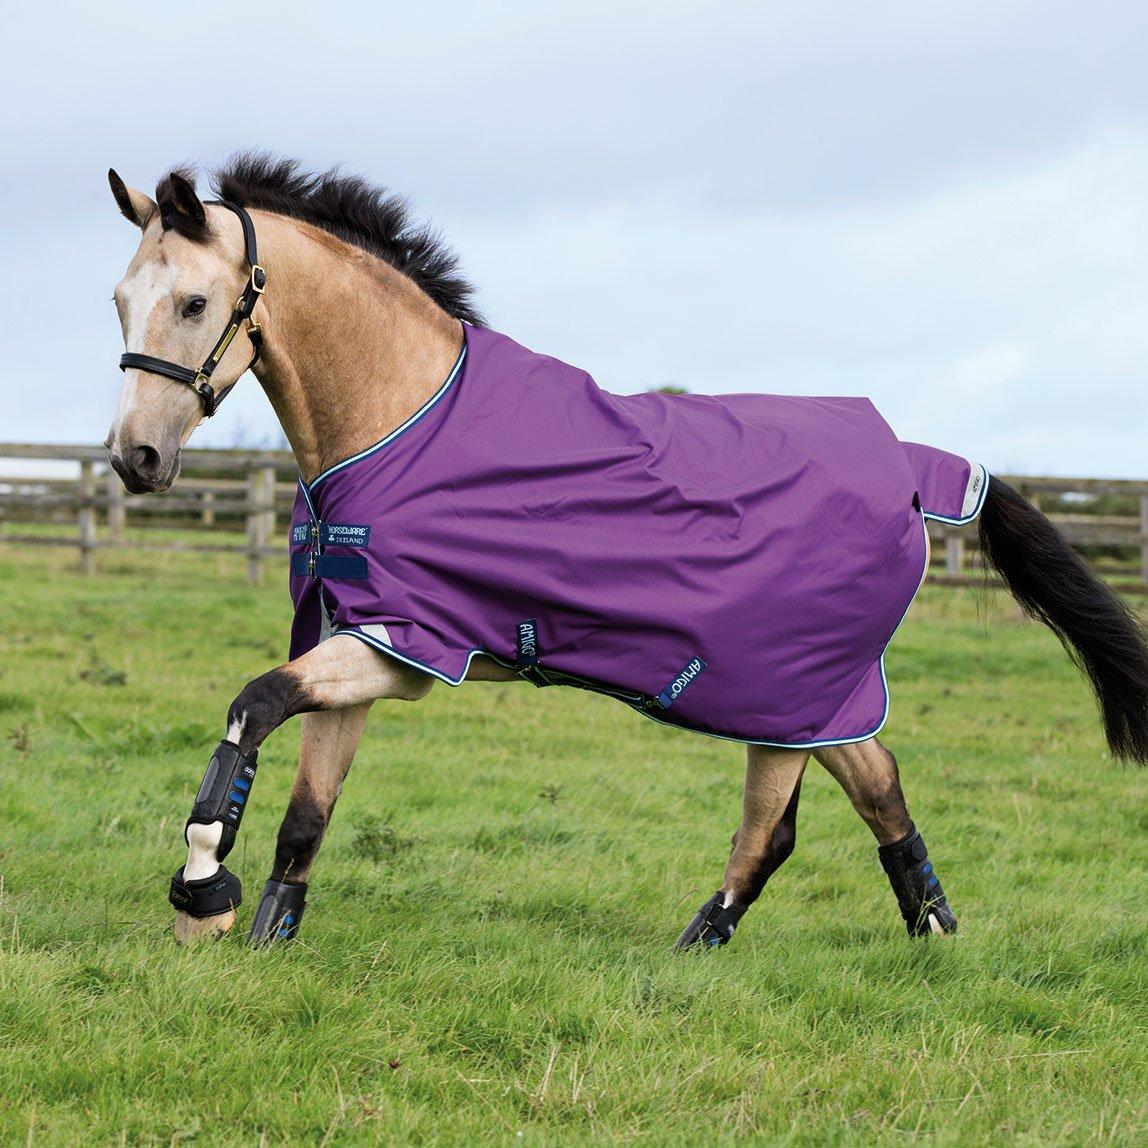 Horseware Amigo Bravo12 Turnout 100g 81 Purple/Nav